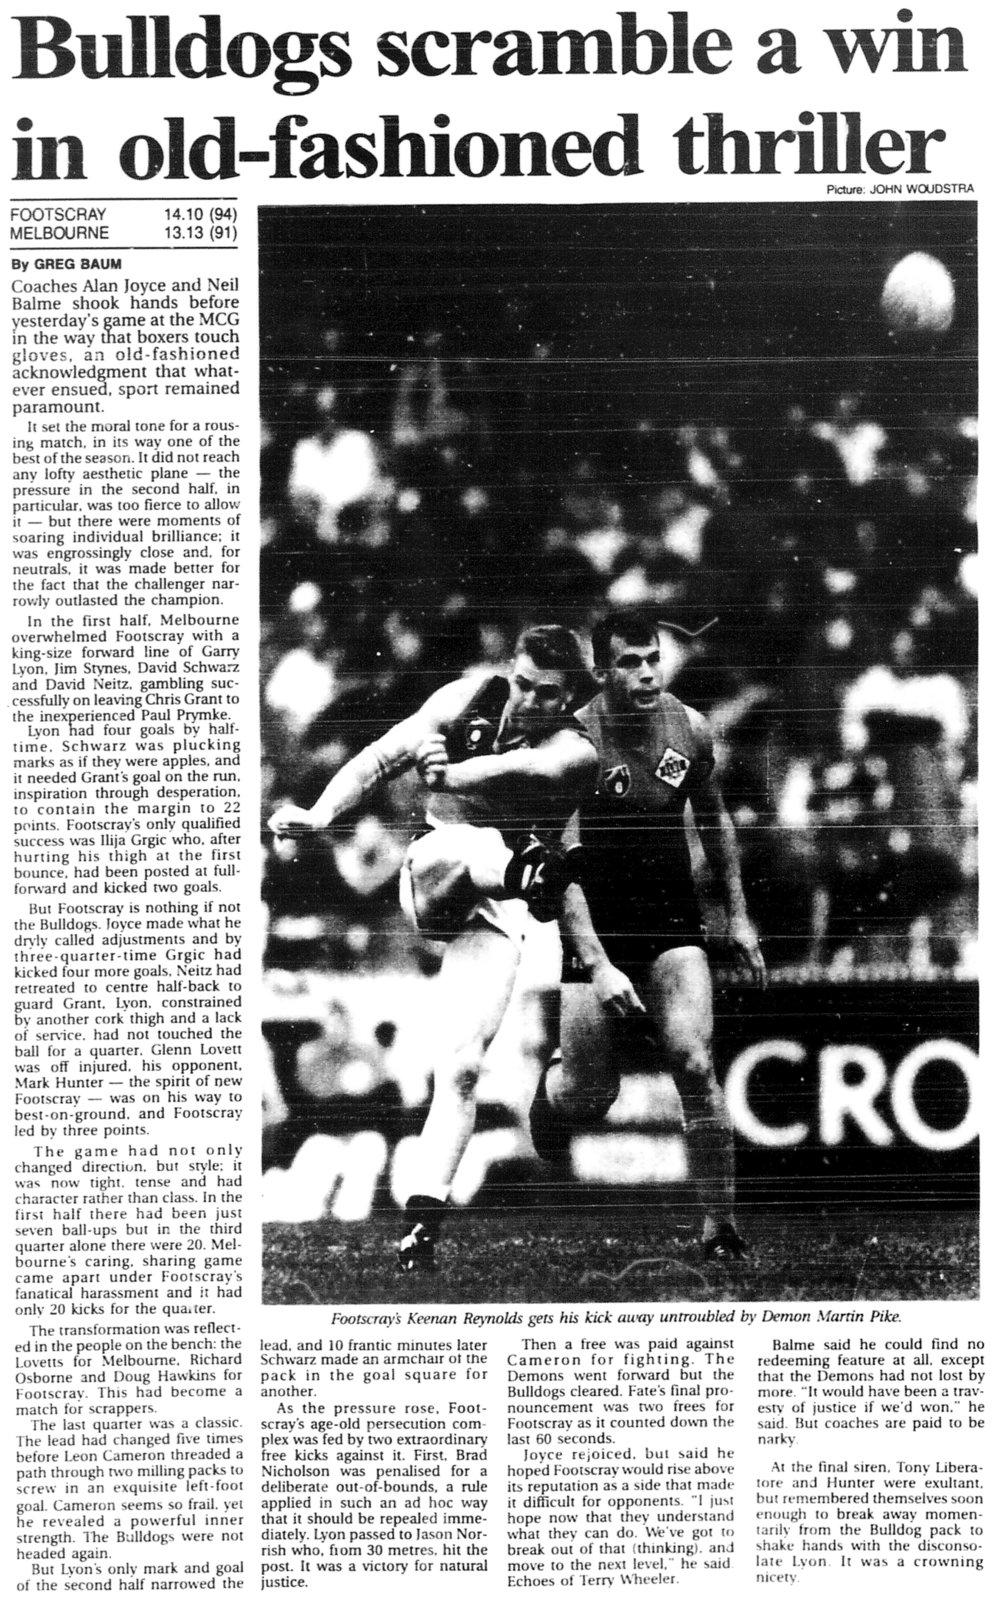 Footscray Football Club - Report [1] - The Age - 16 May 1994.jpg